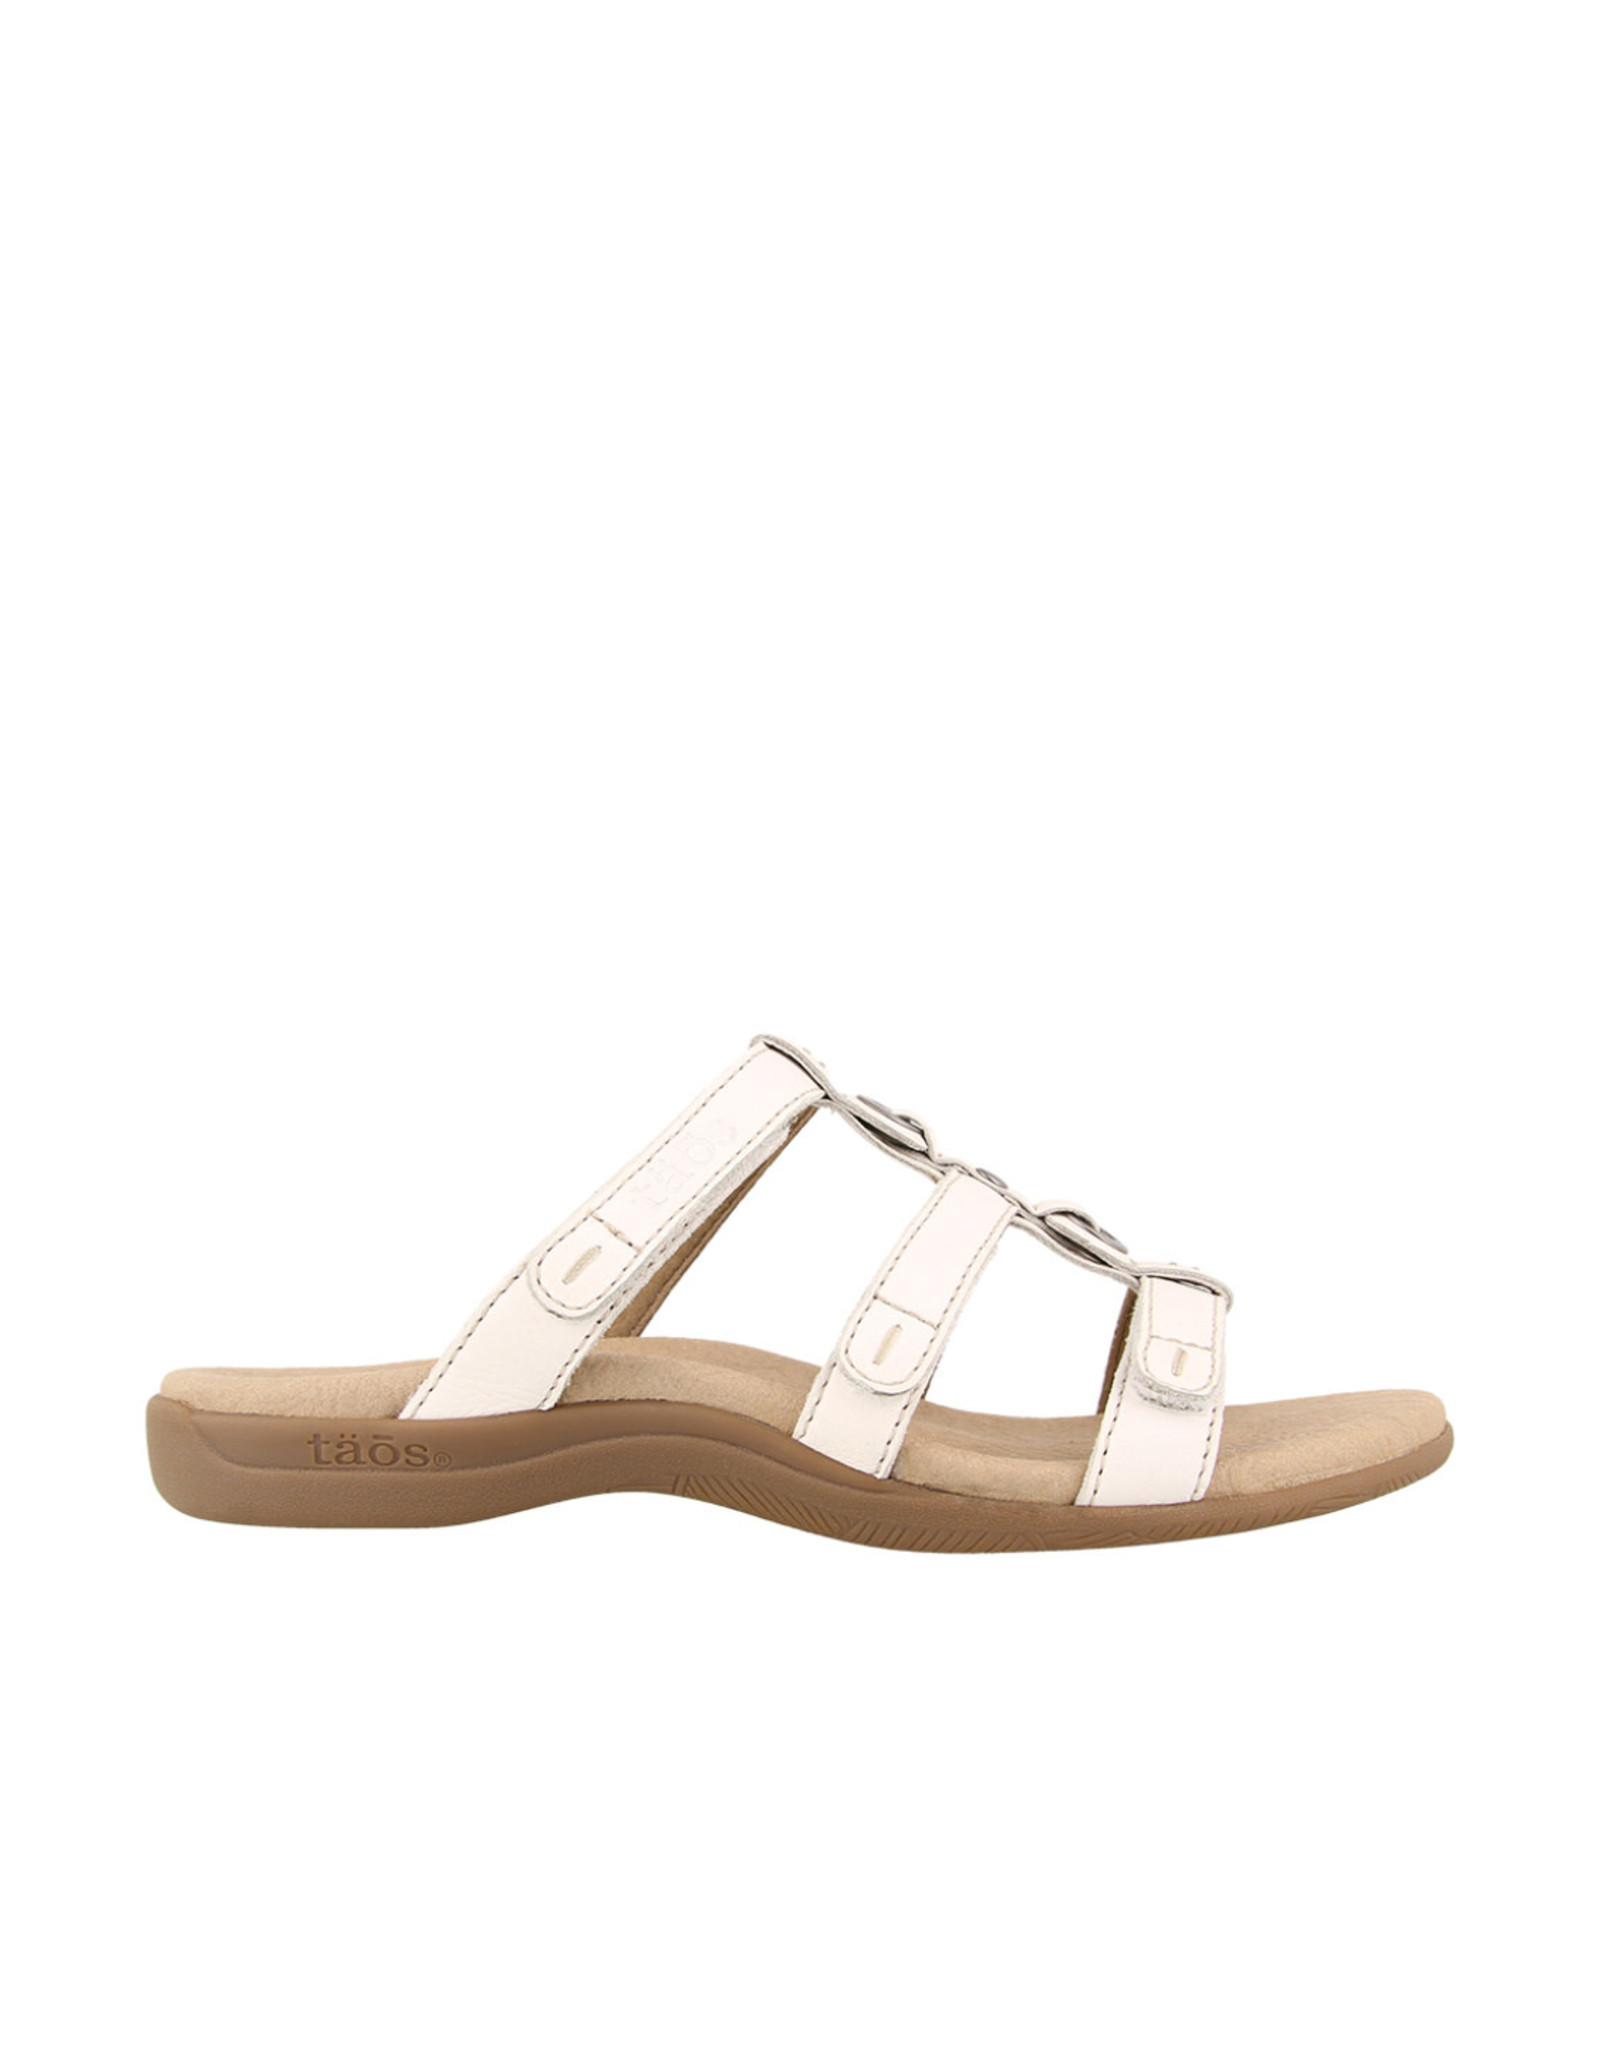 Taos Footwear Taos Nifty Leather Slip on Sandal